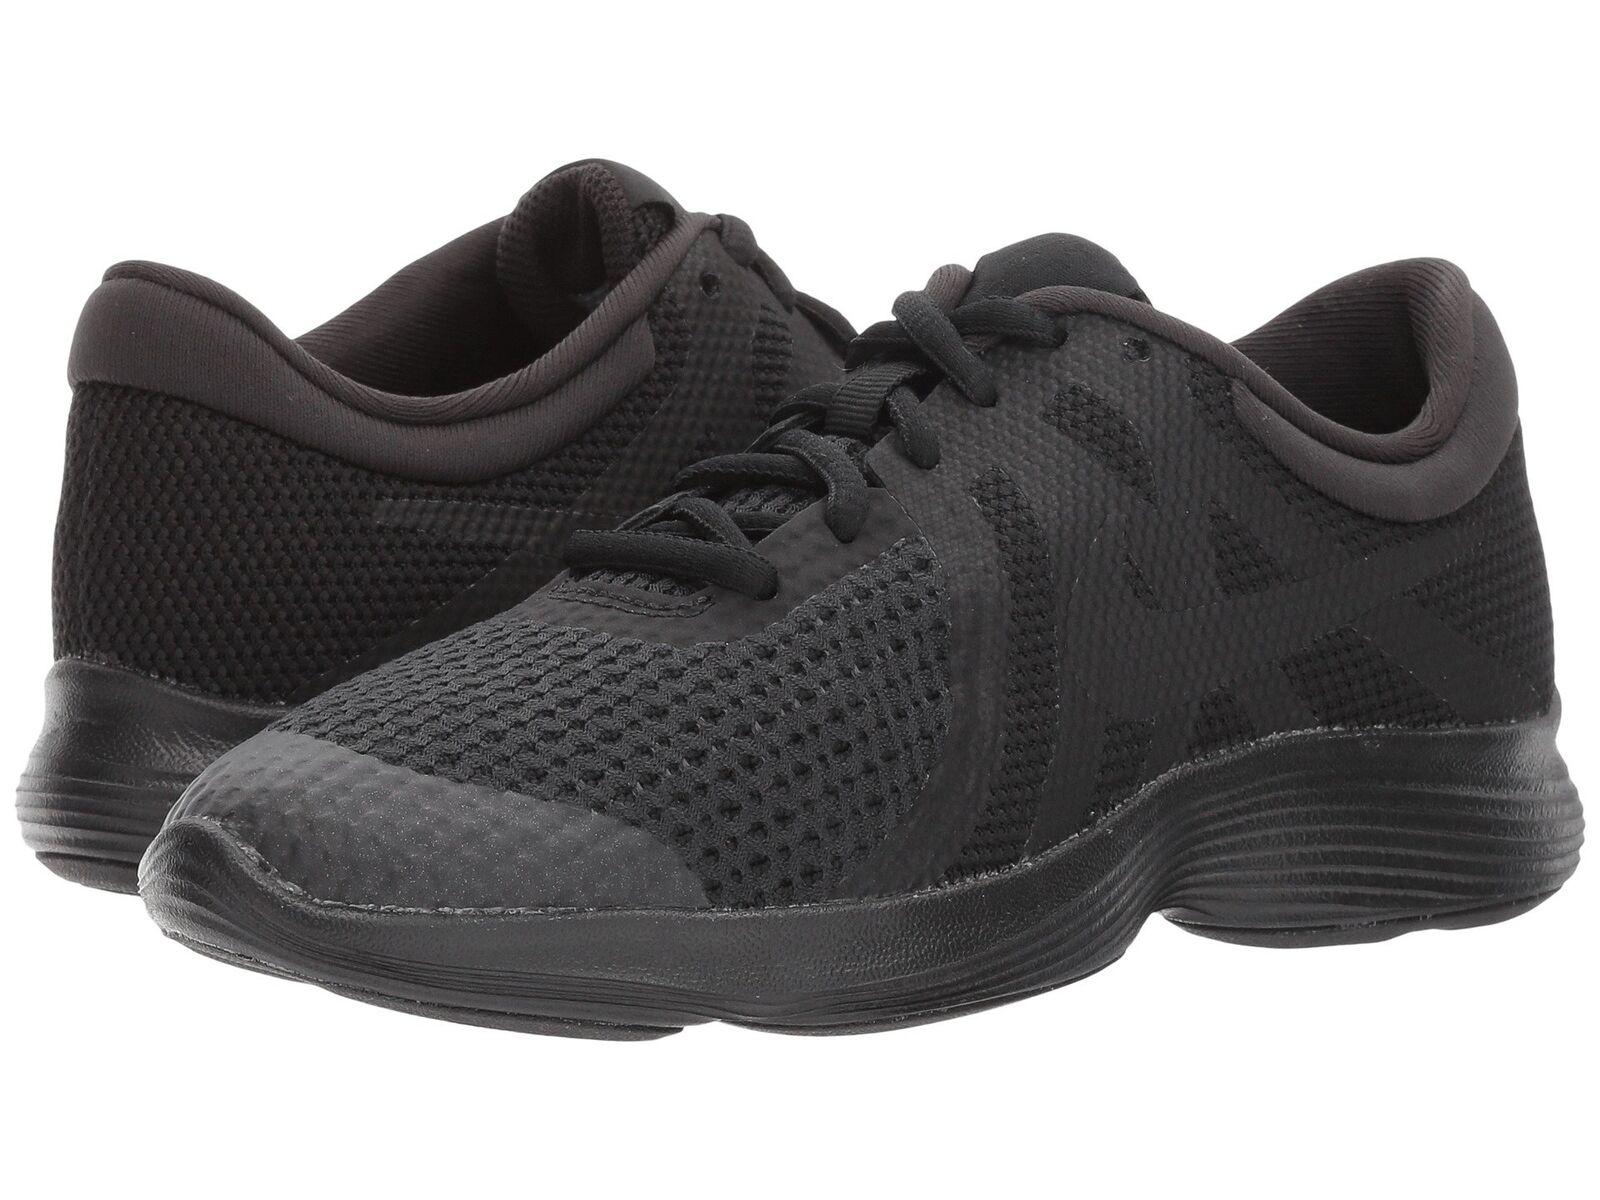 shoes Nike 943309 004 Revolution 4 GS Black junior Mode casual Sneakers Sport